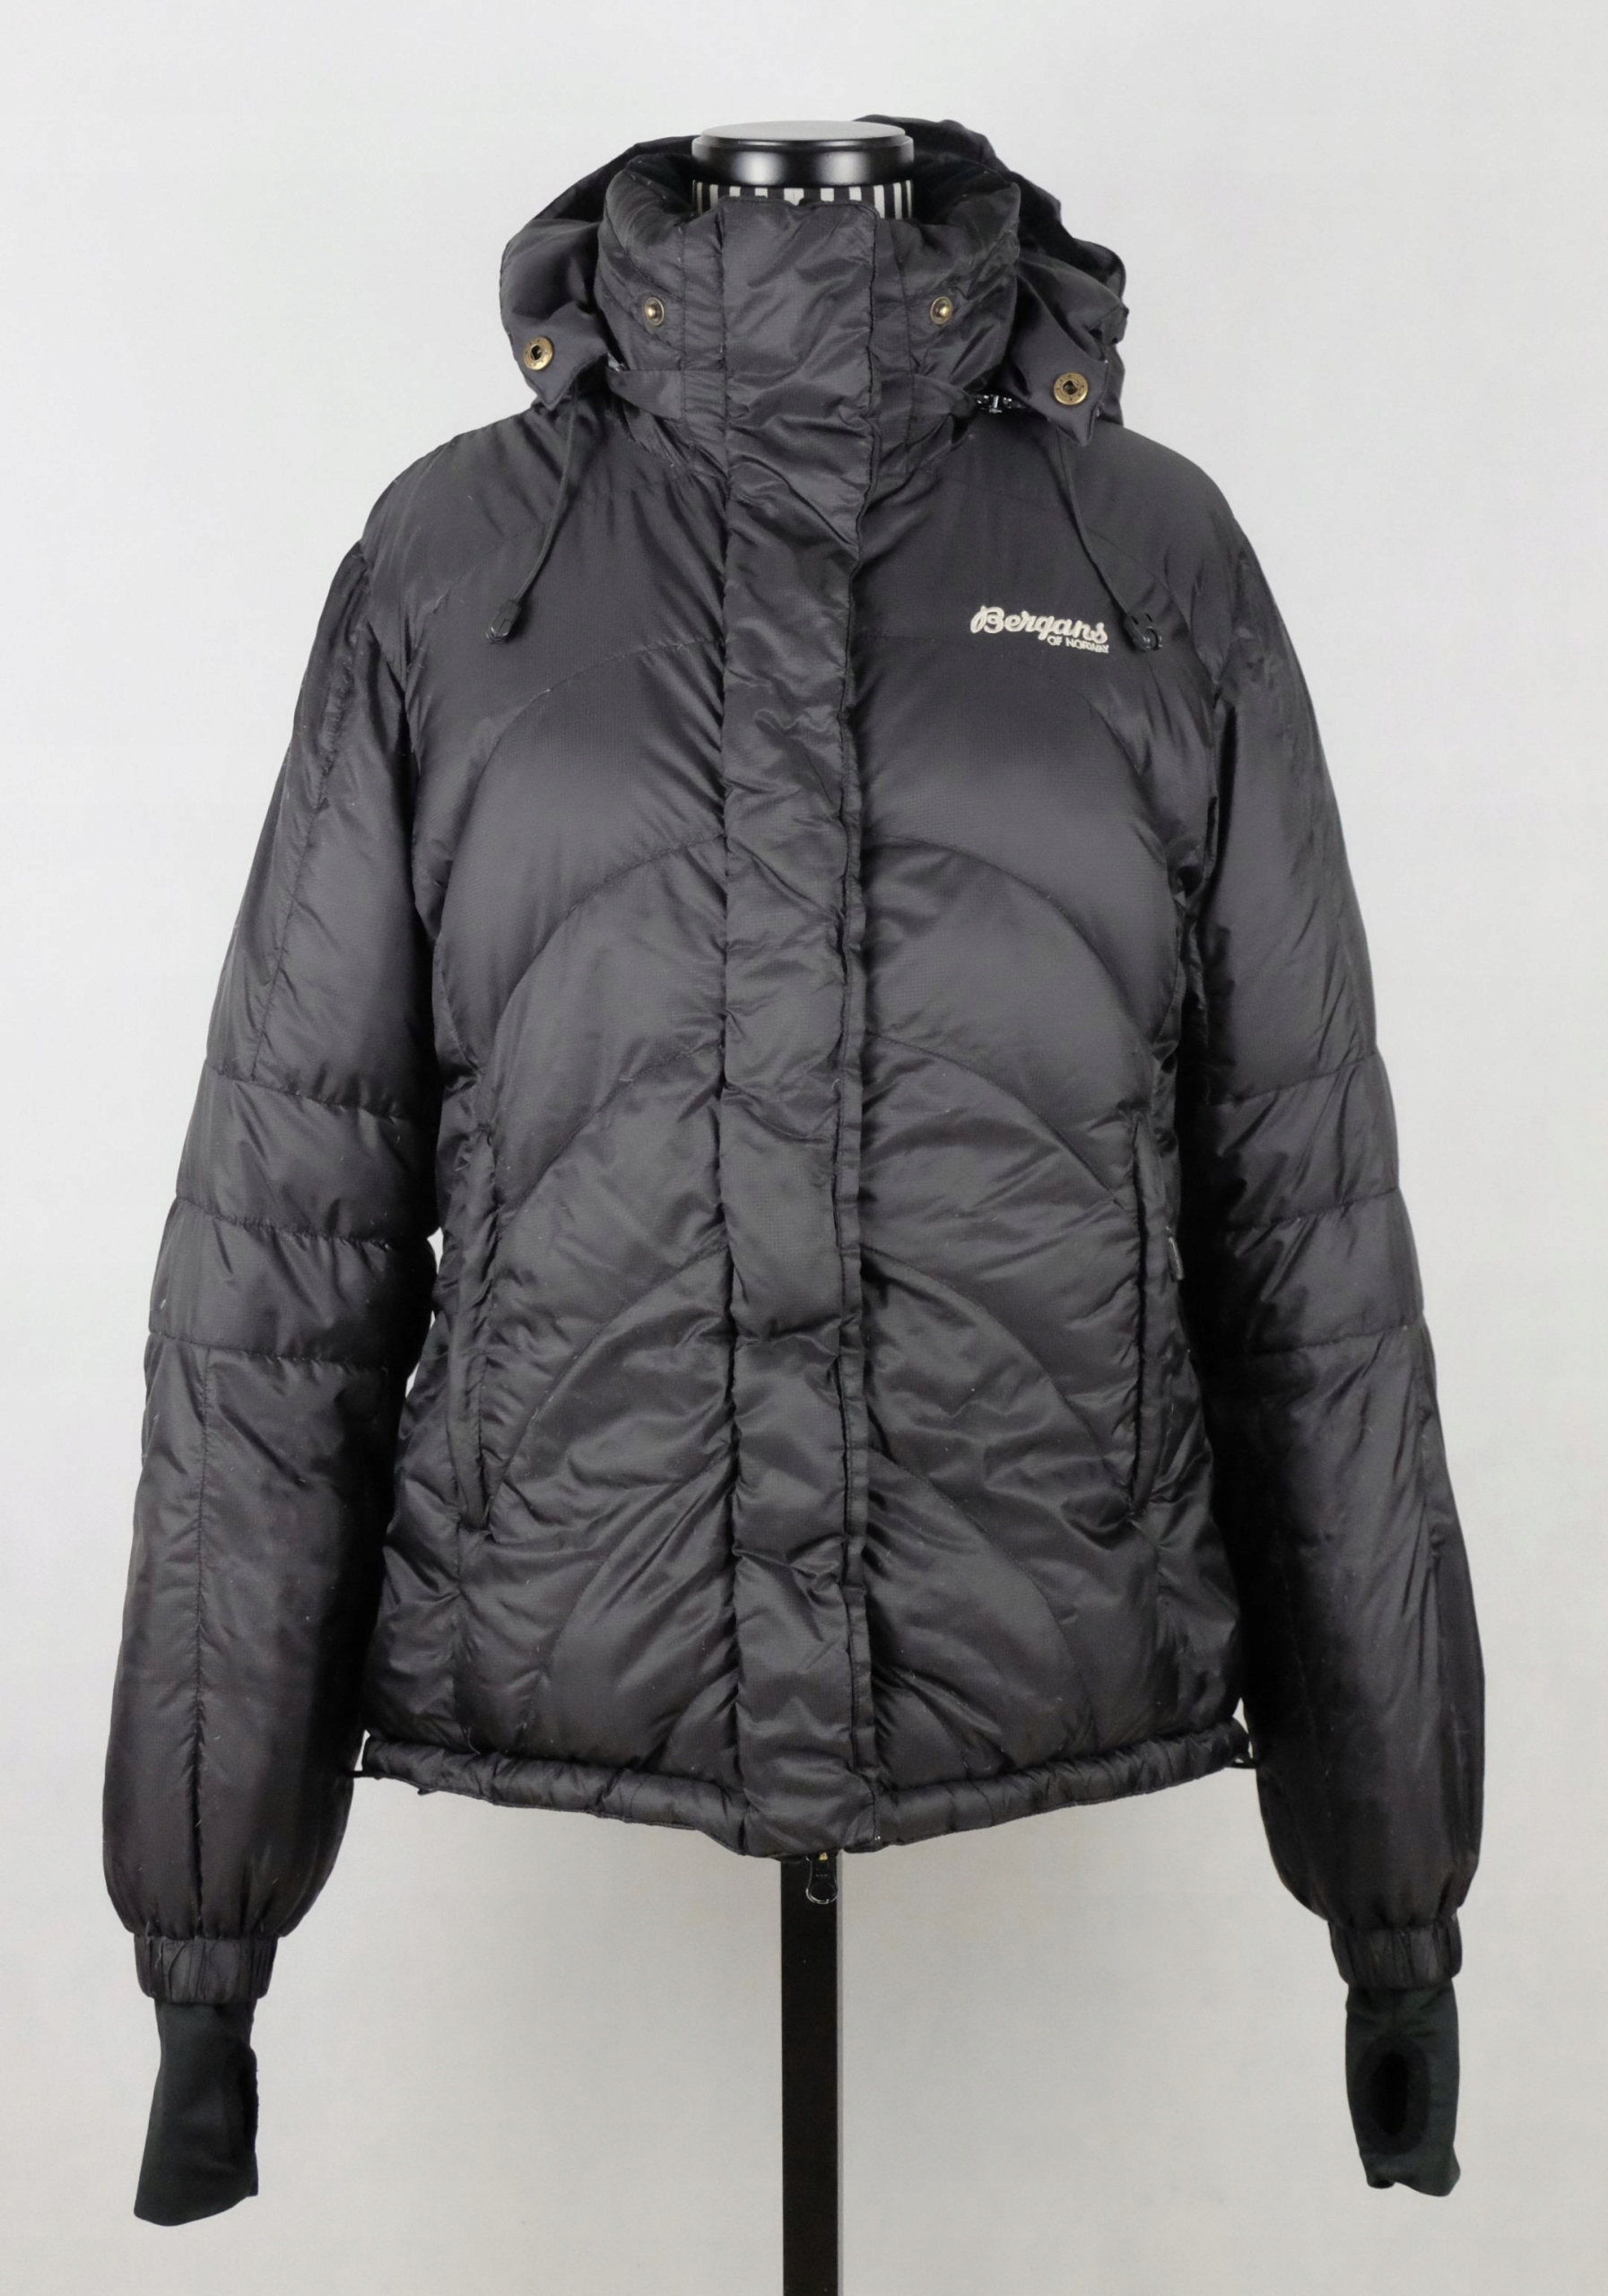 BERGANS Short Down Jacket Lady kurtka puch S